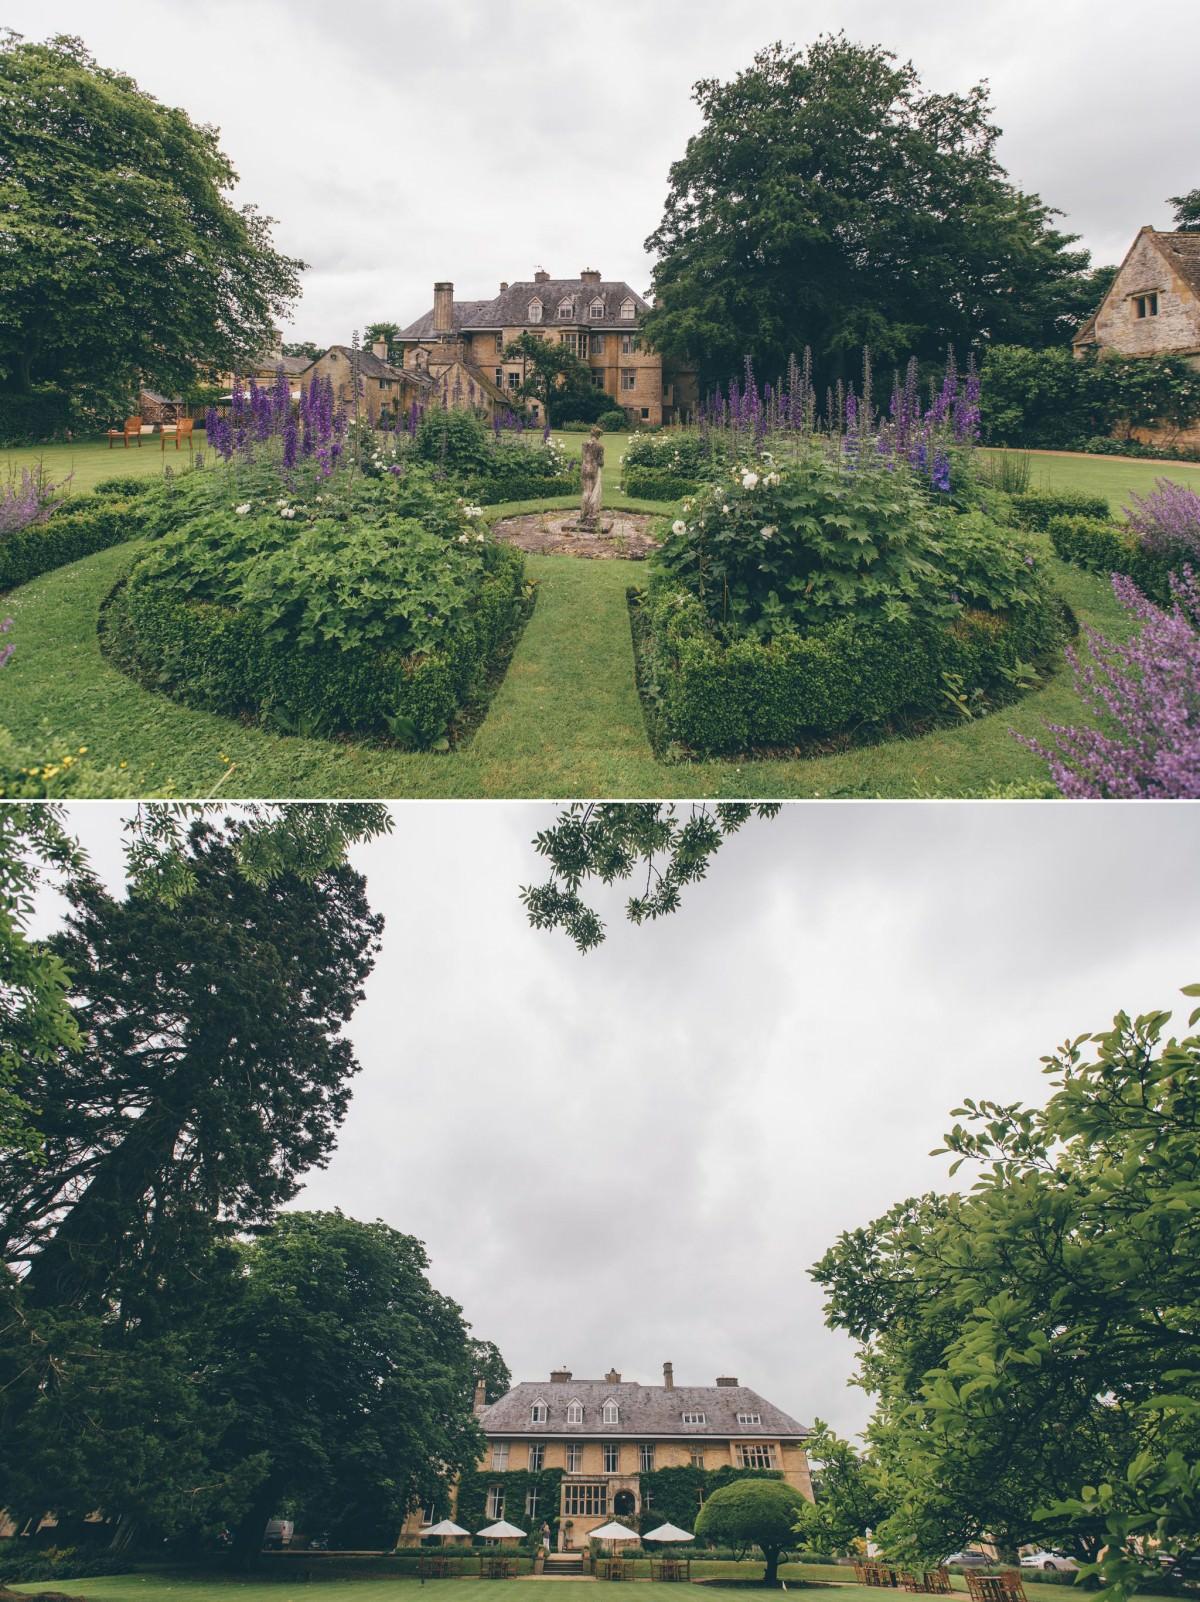 welsh_wedding_photographer_rachel_lambert_photography_lower_slaughter_manor_house_cotswolds_harriet_dean_ 4